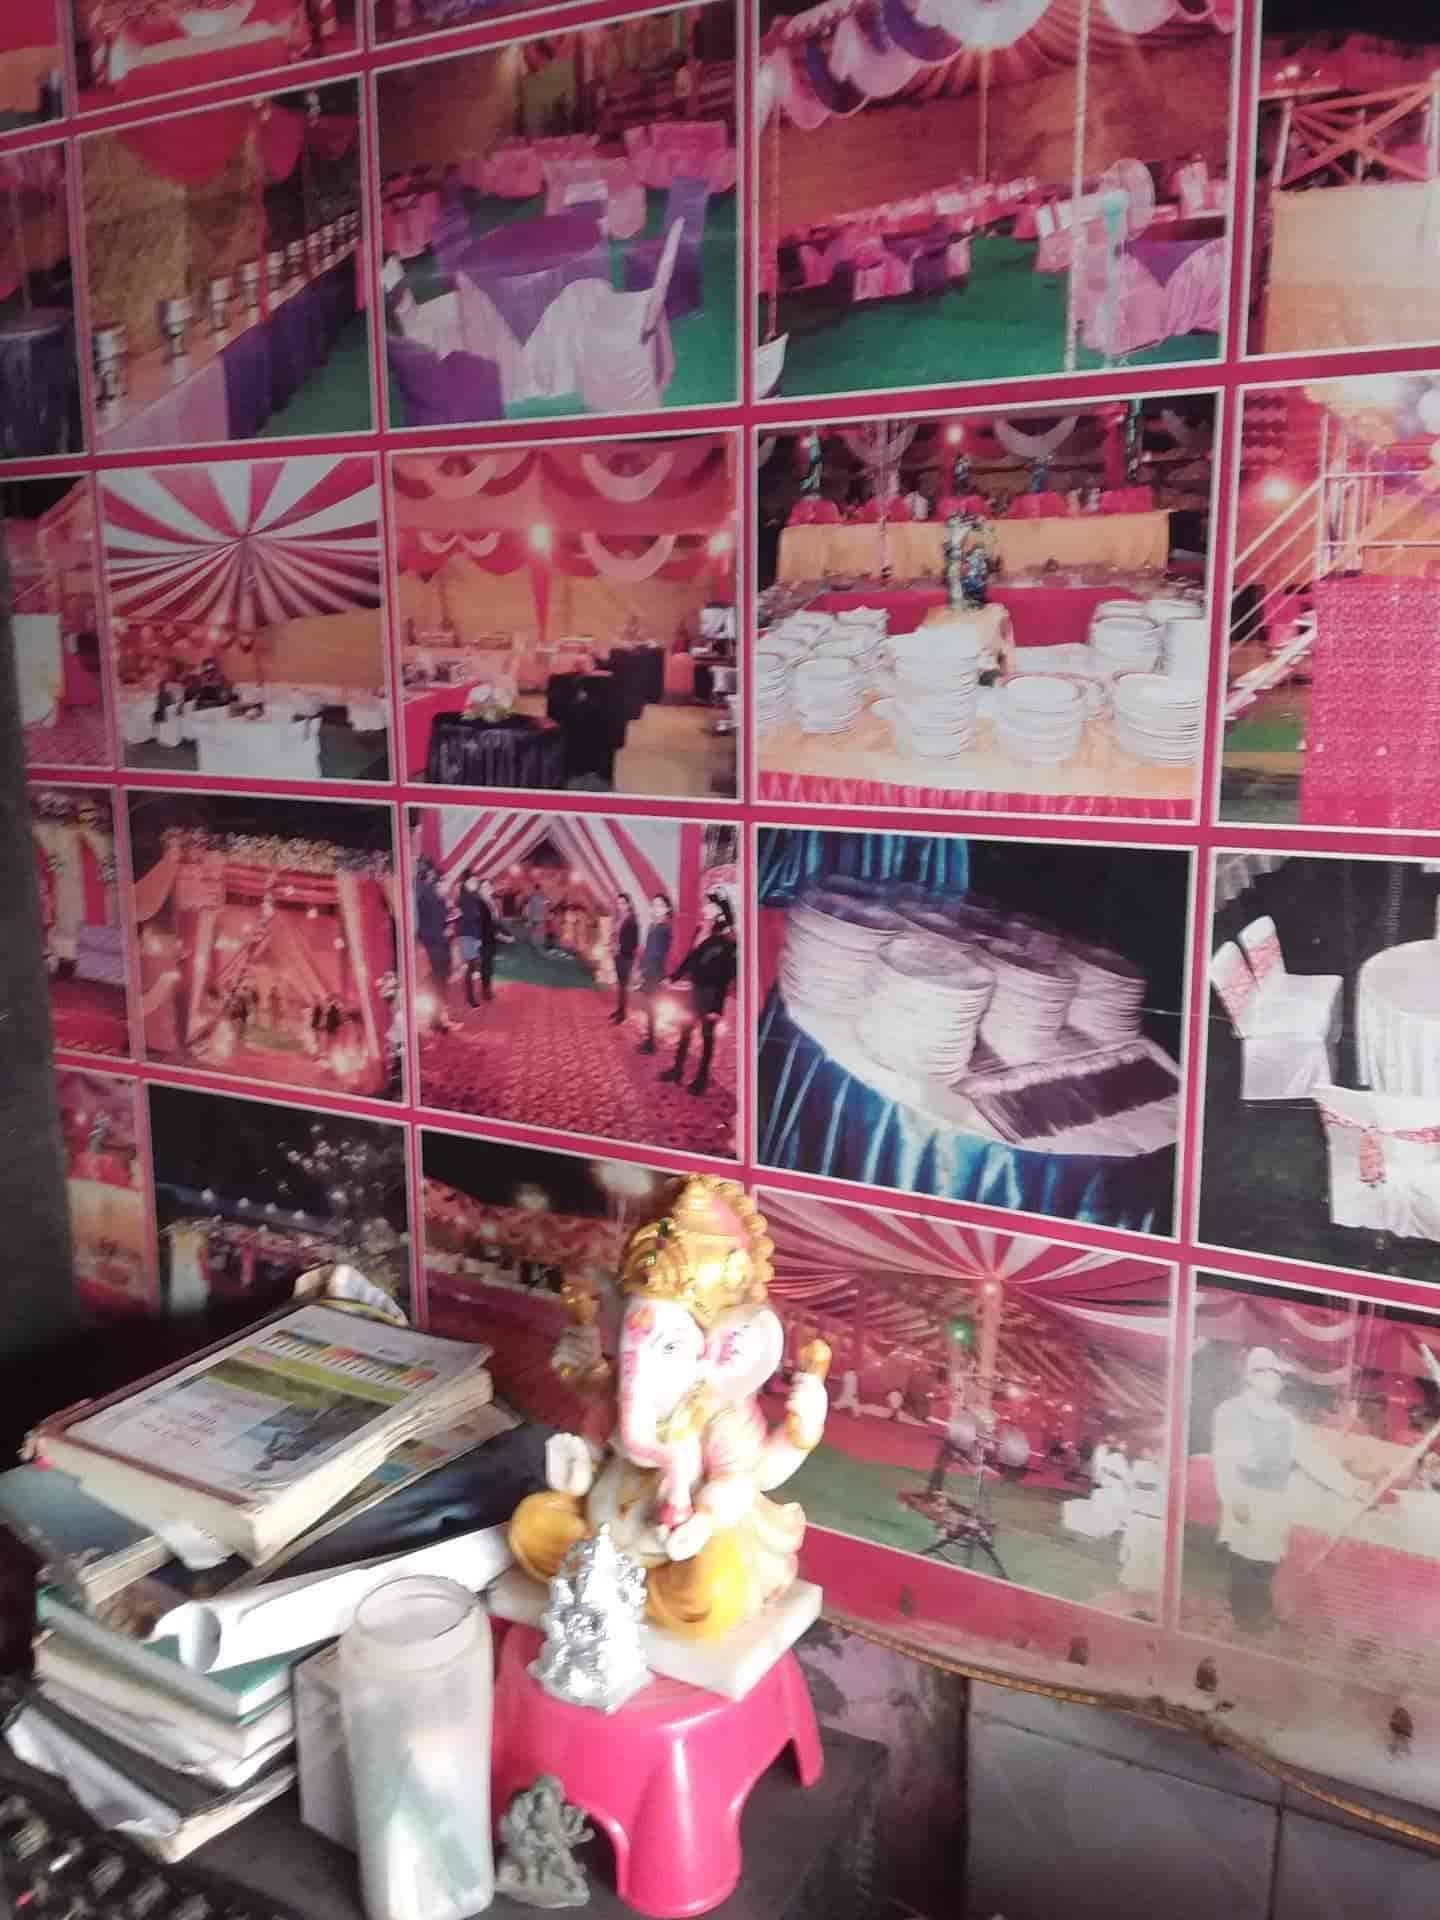 Subhash Ji Tent House Photos Tilak Nagar Delhi Pictures Images